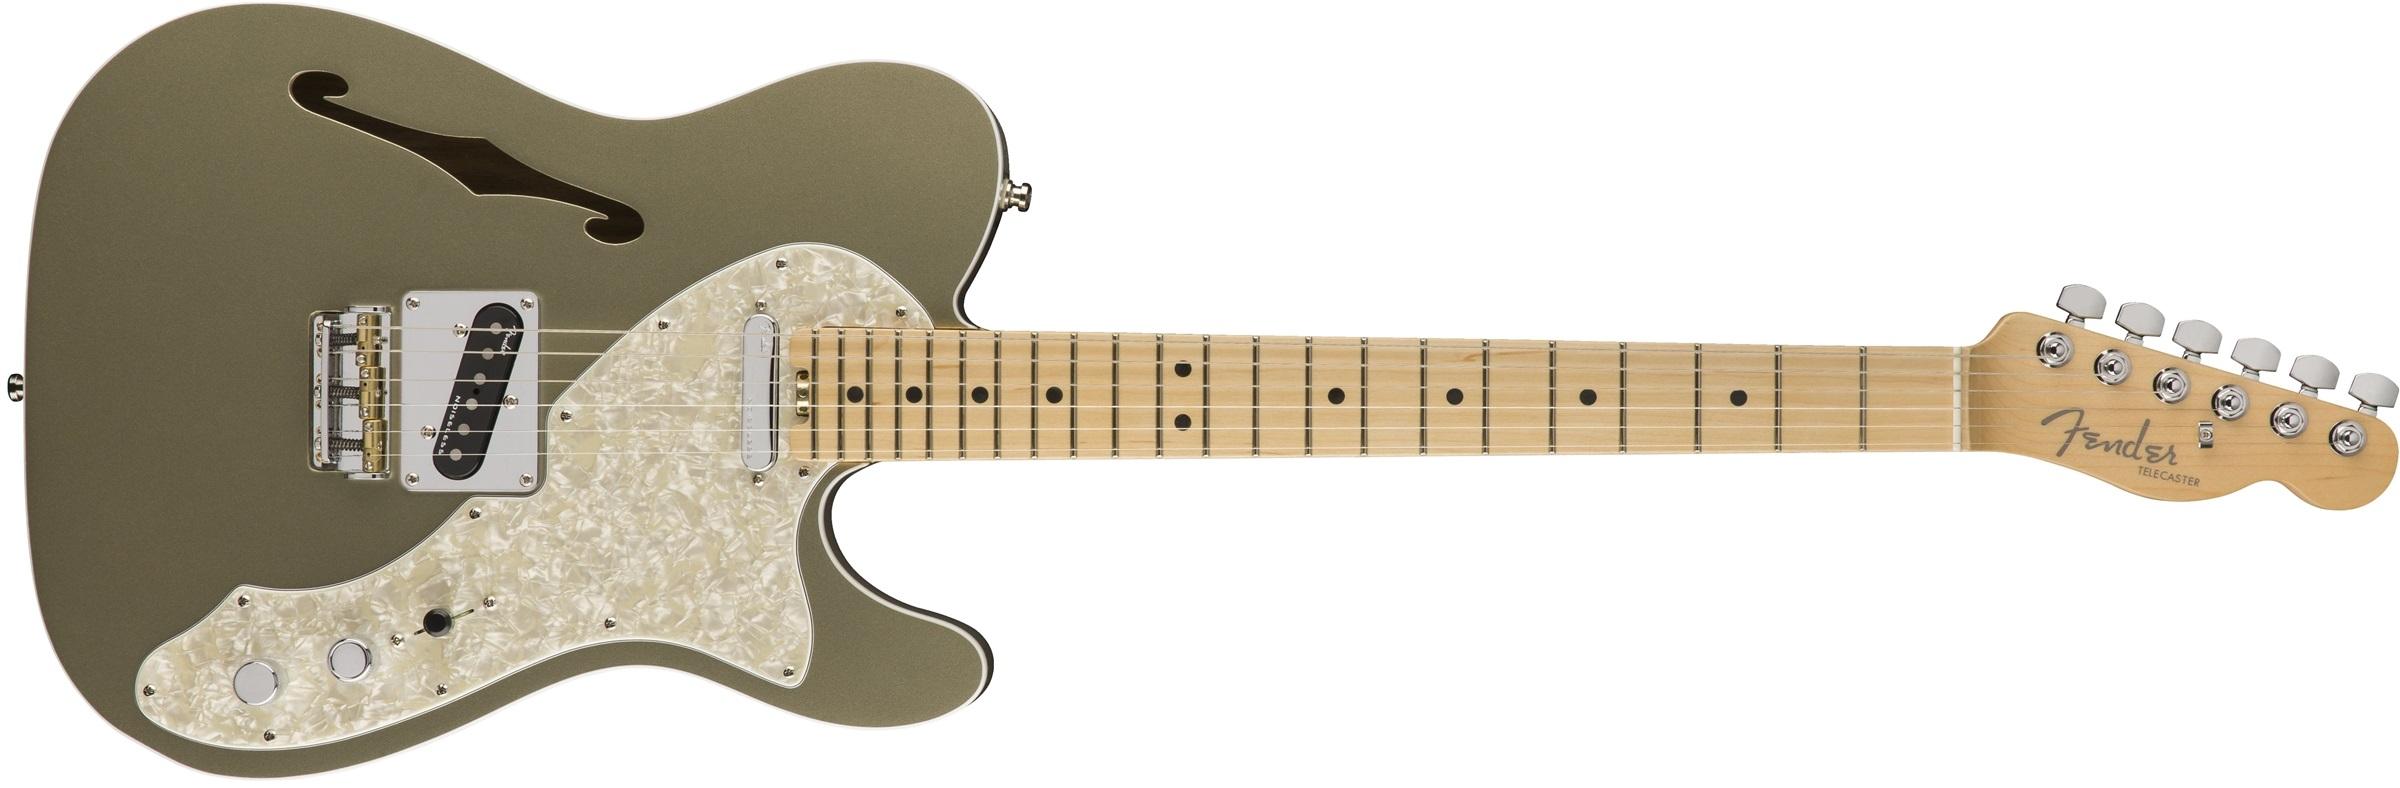 Fender American Elite Telecaster Thinline MN CHMP